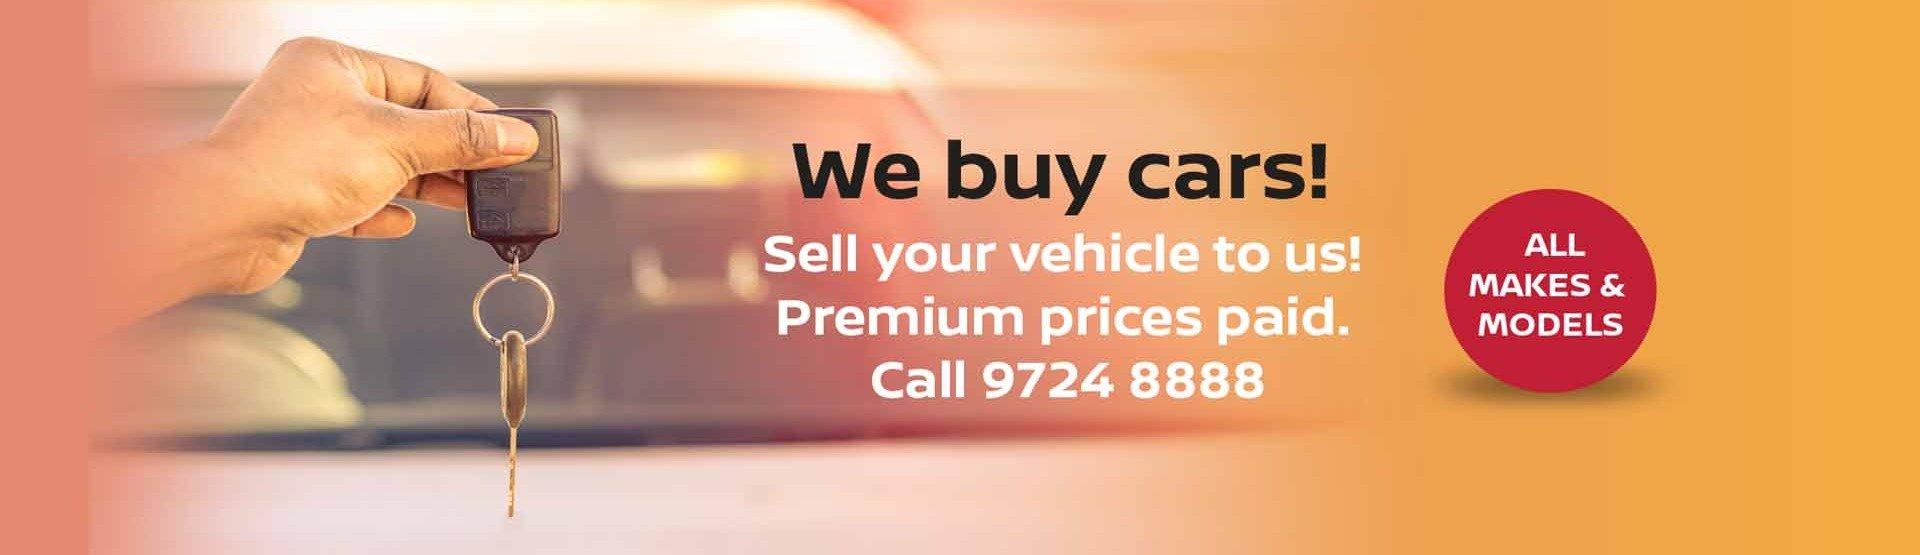 FTG Nissan We Buy Cars